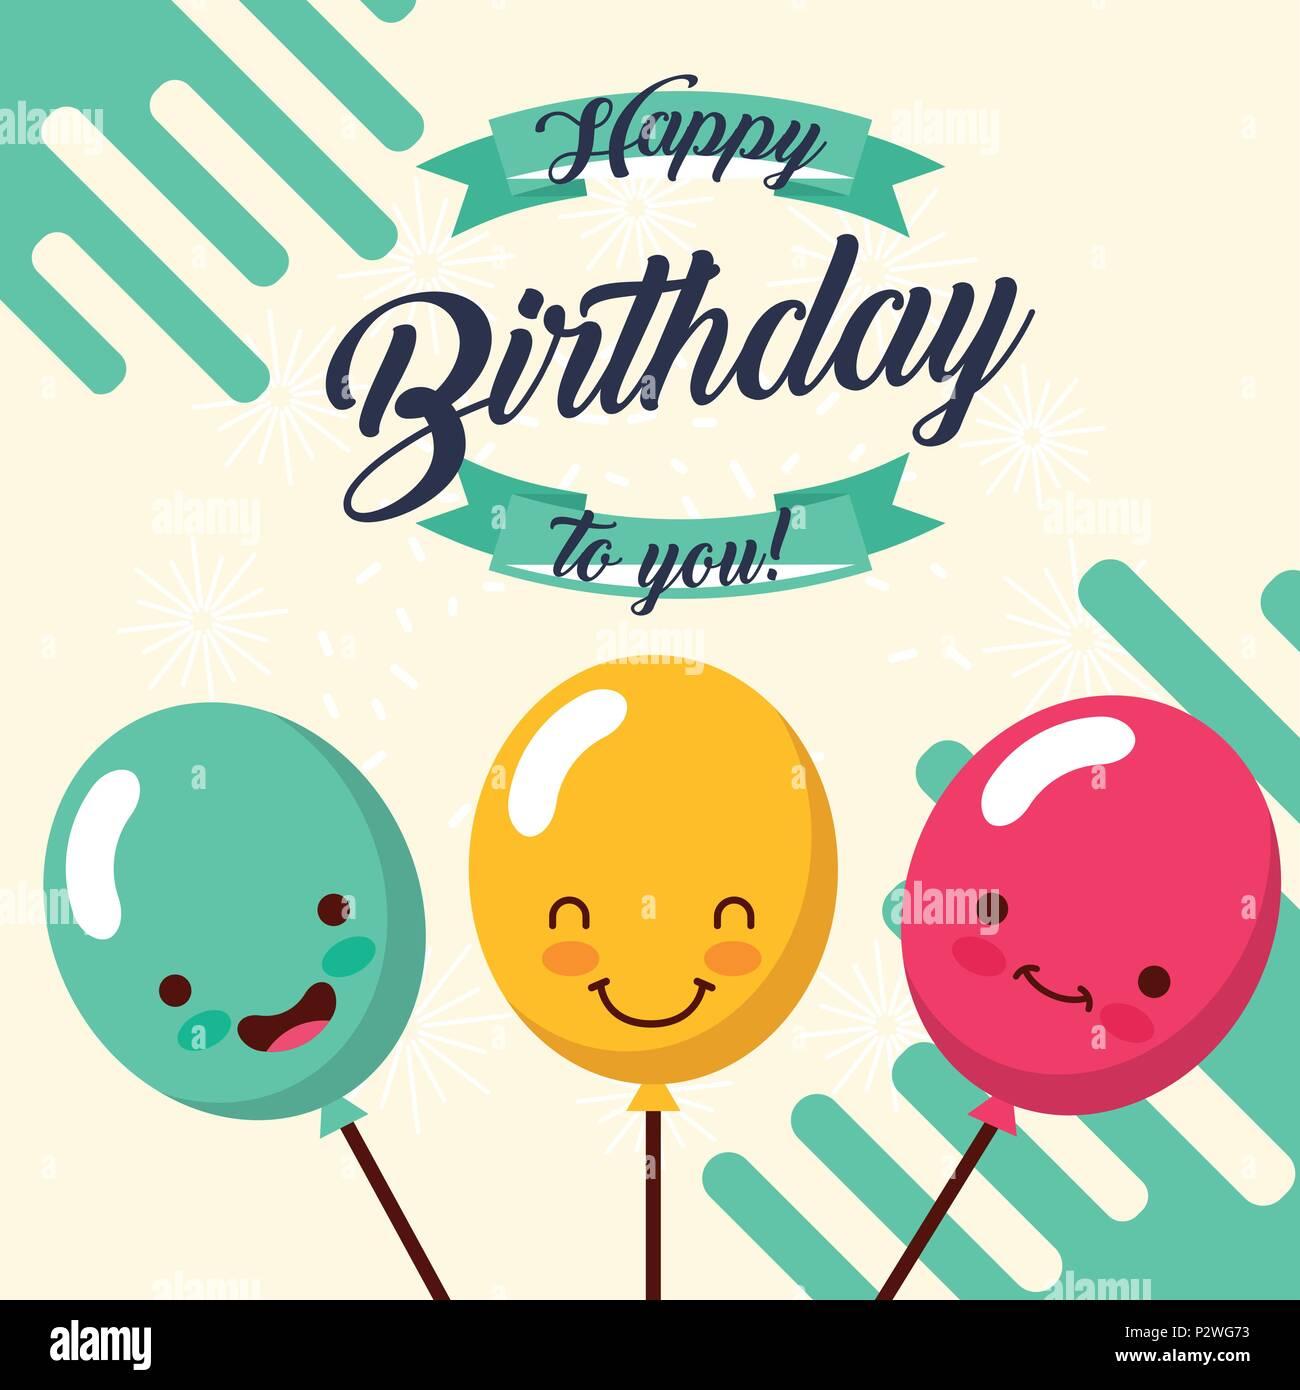 Kawaii Luftballons In Stick Feier Happy Birthday Card Vector Illustration